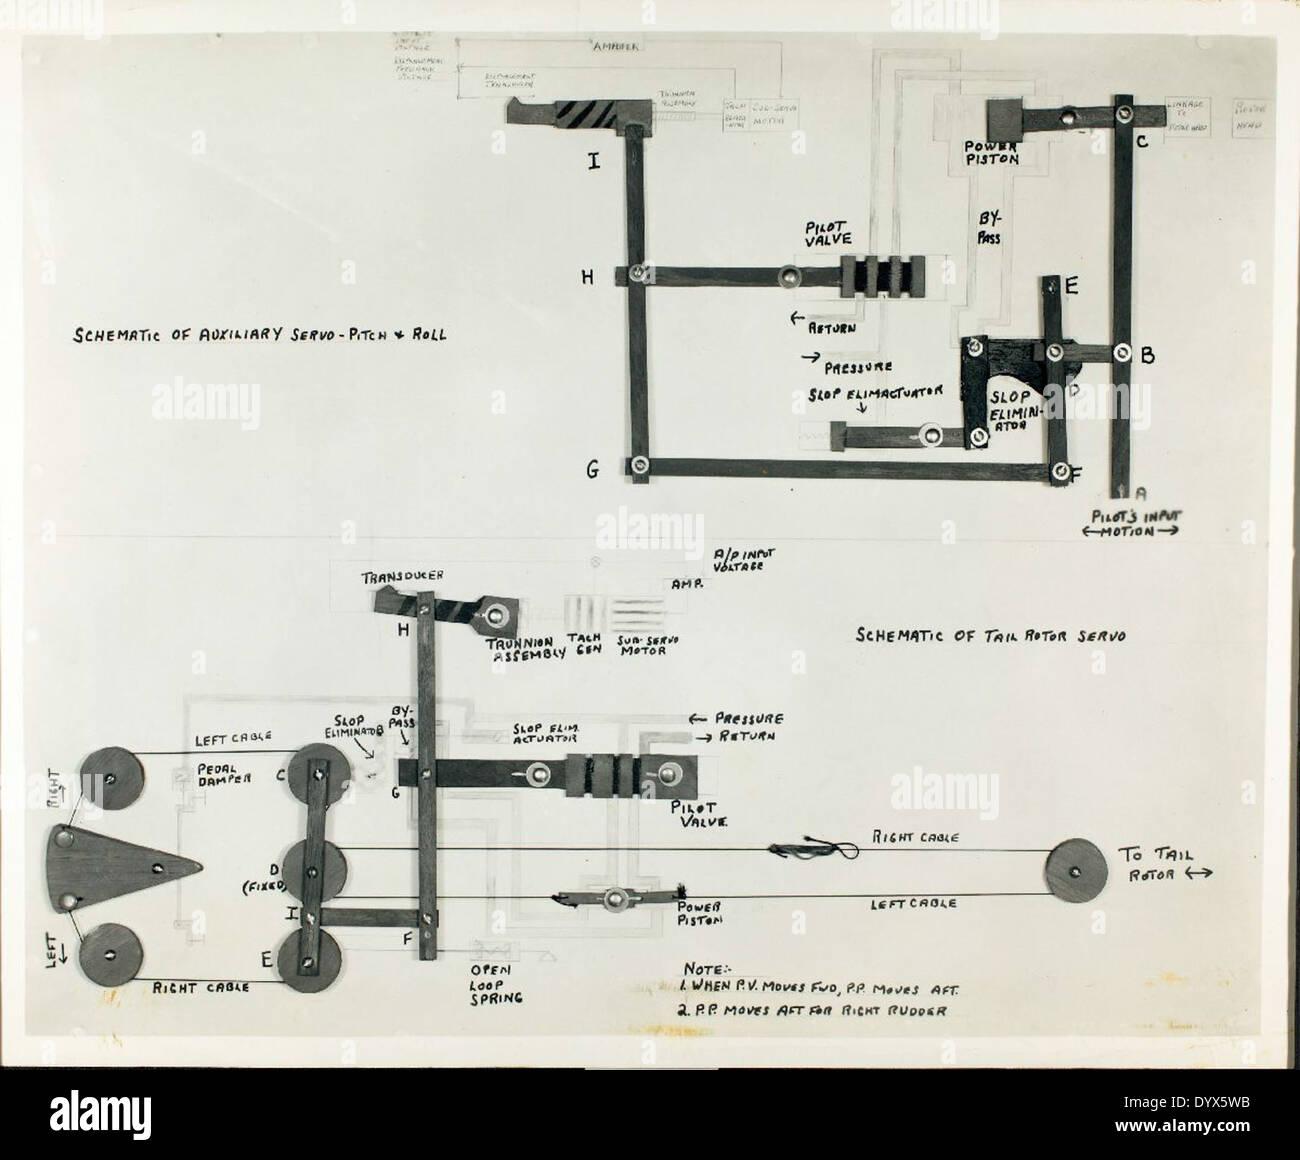 Fantastisch Sr20de Schaltplan Galerie - Elektrische Schaltplan-Ideen ...